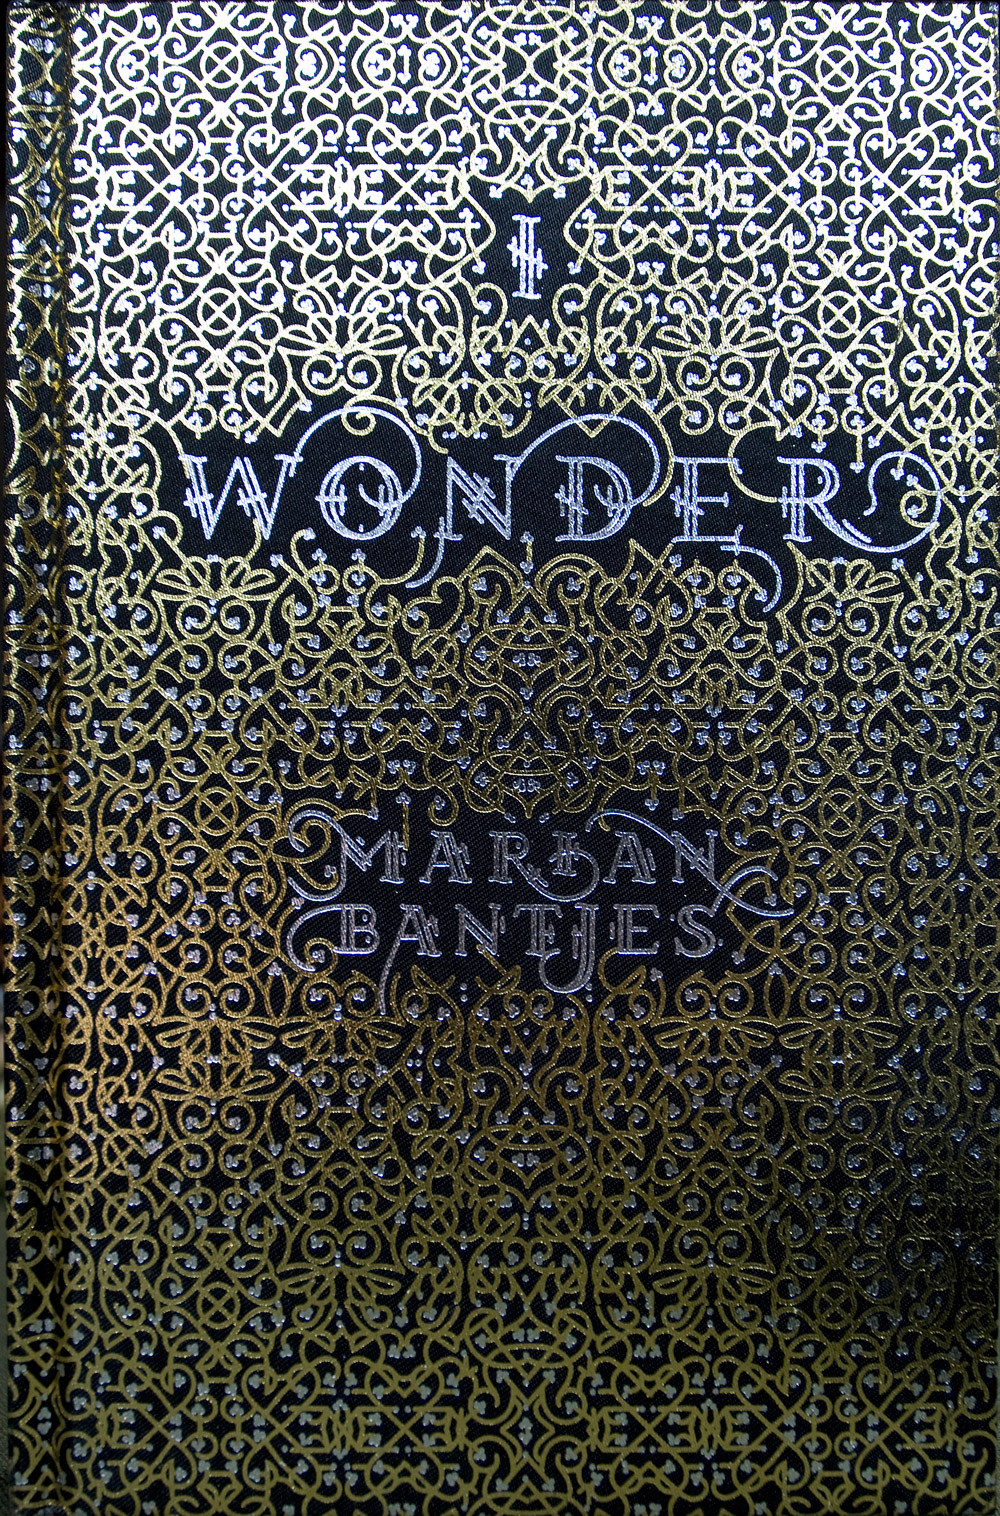 """I Wonder"" book cover by Marian Bantjes"